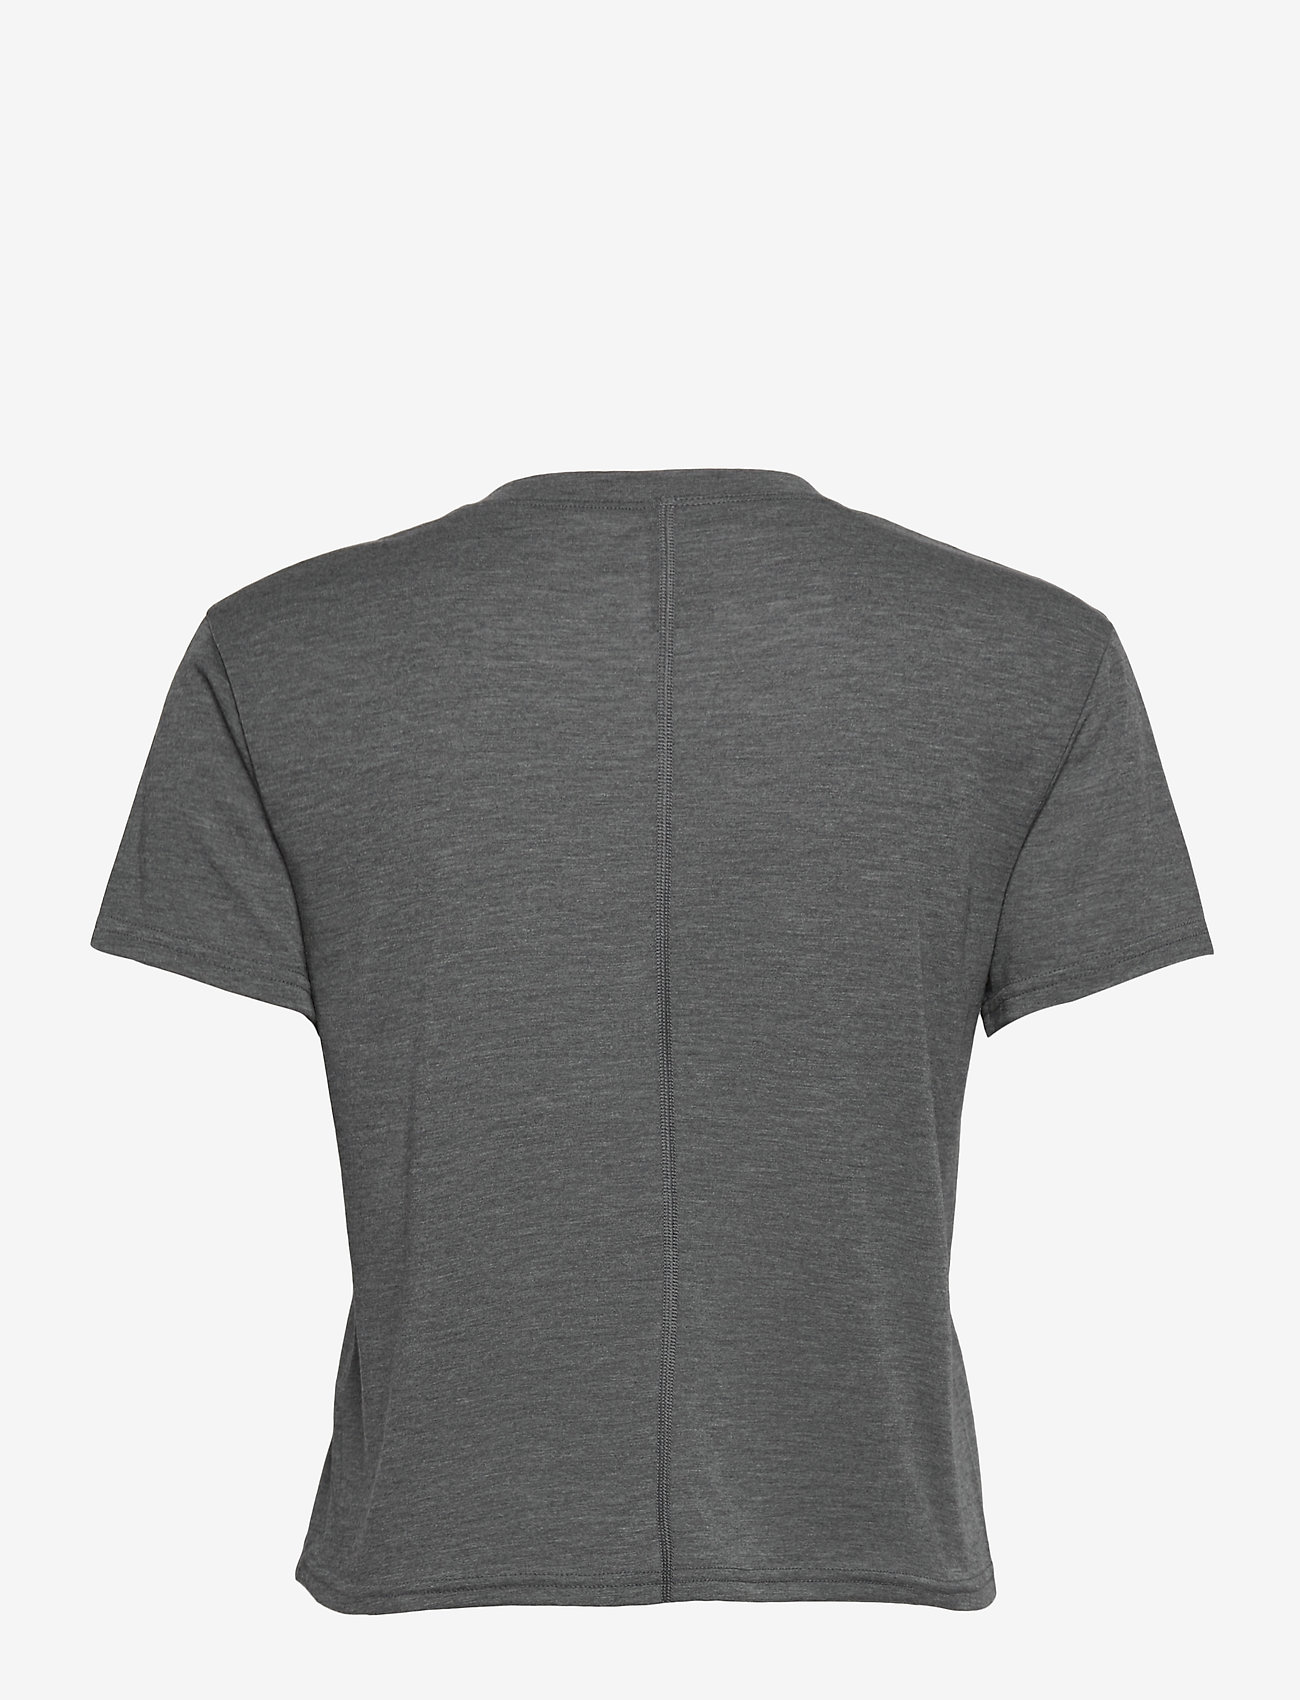 Johaug - Aerial Woolmix Tee - t-shirts - tblck - 1